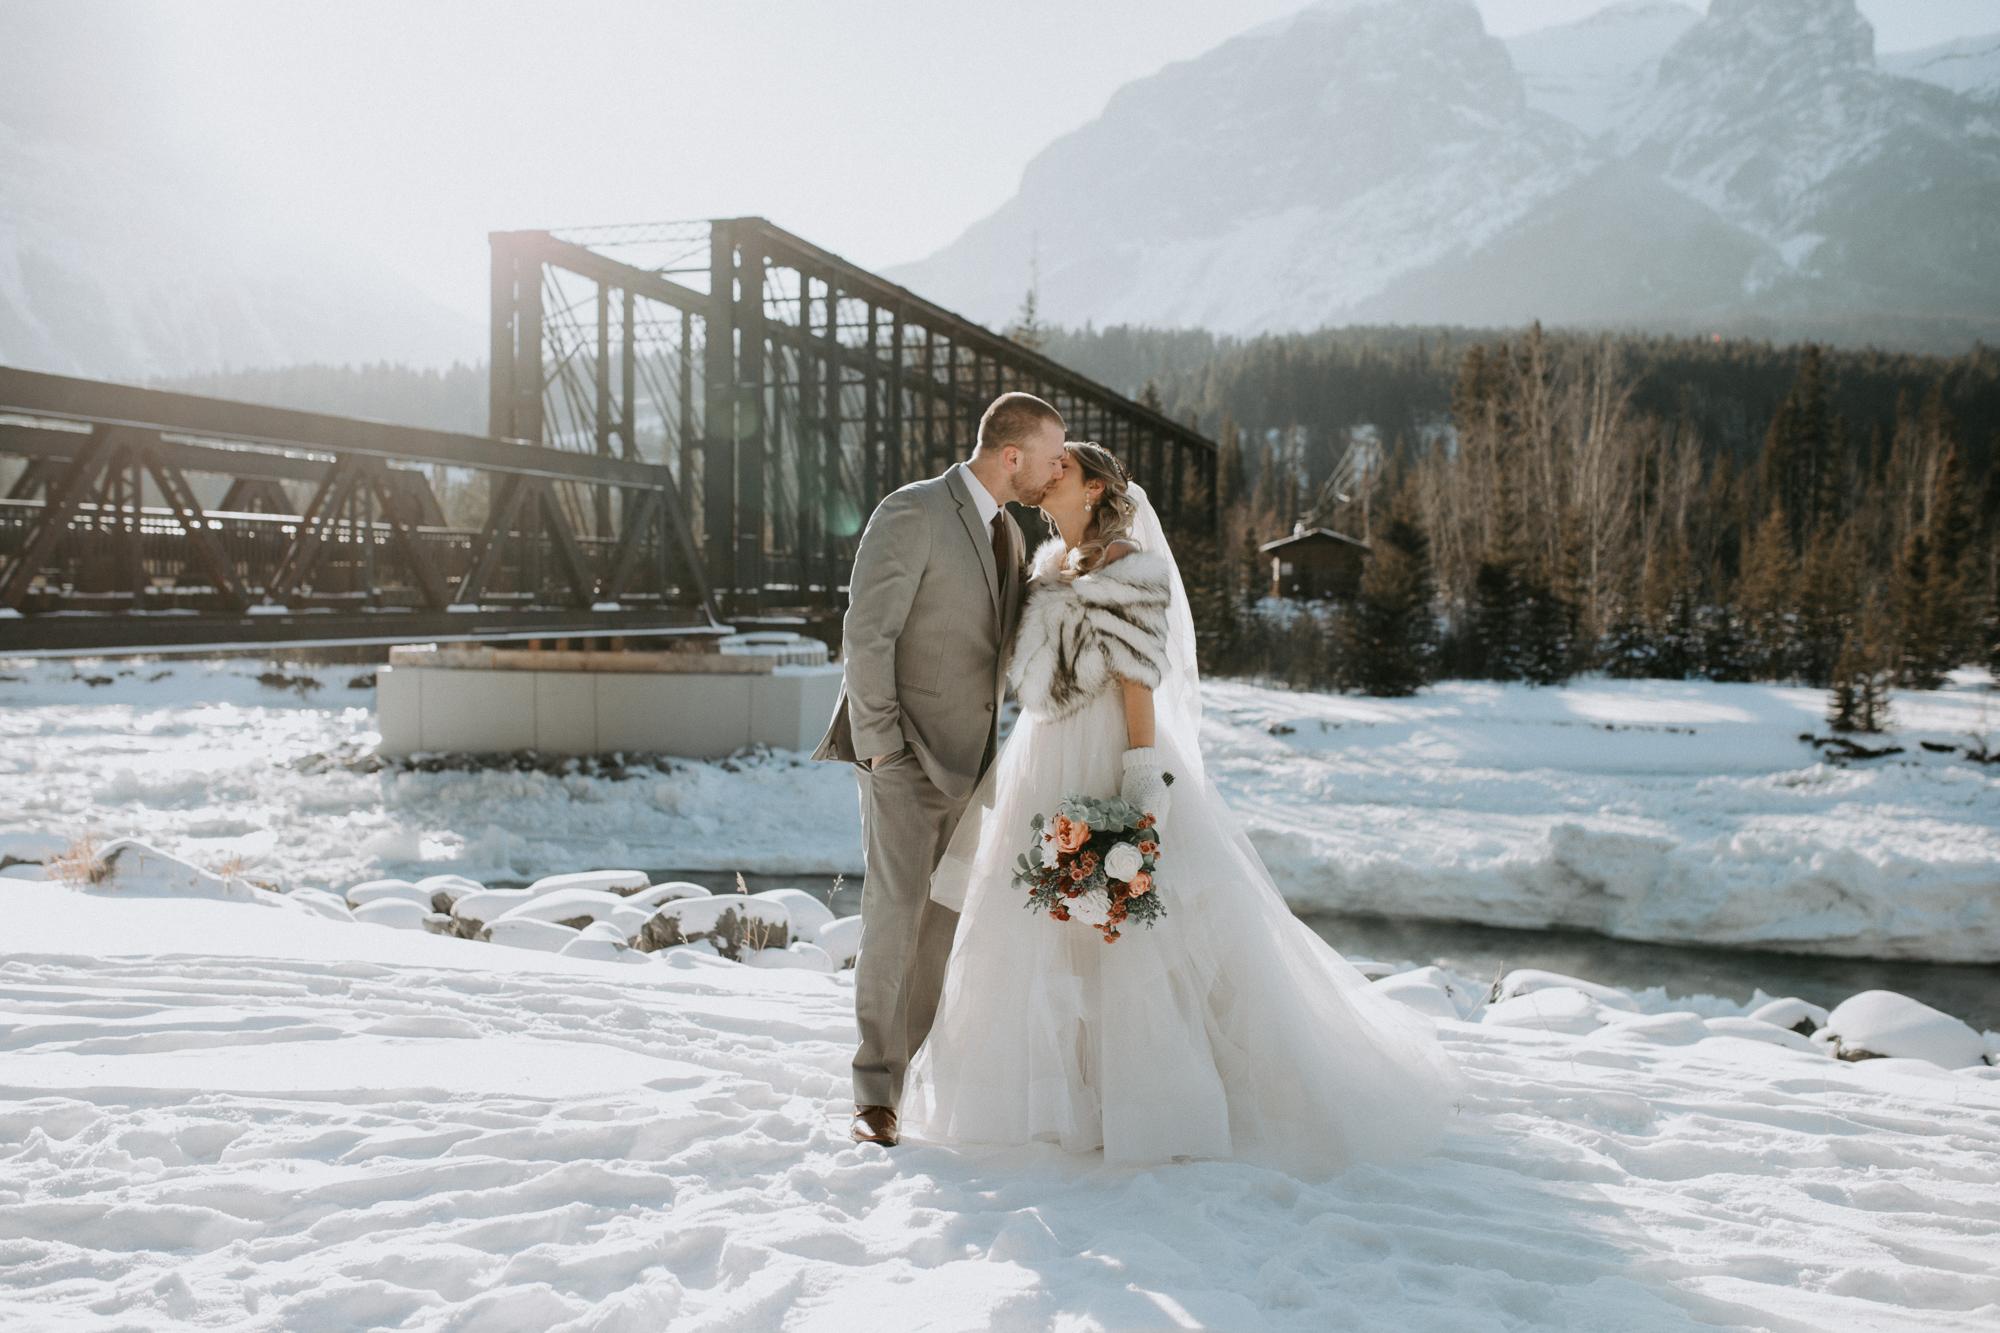 Stewart-Creek-Wedding-AJ-62.jpg